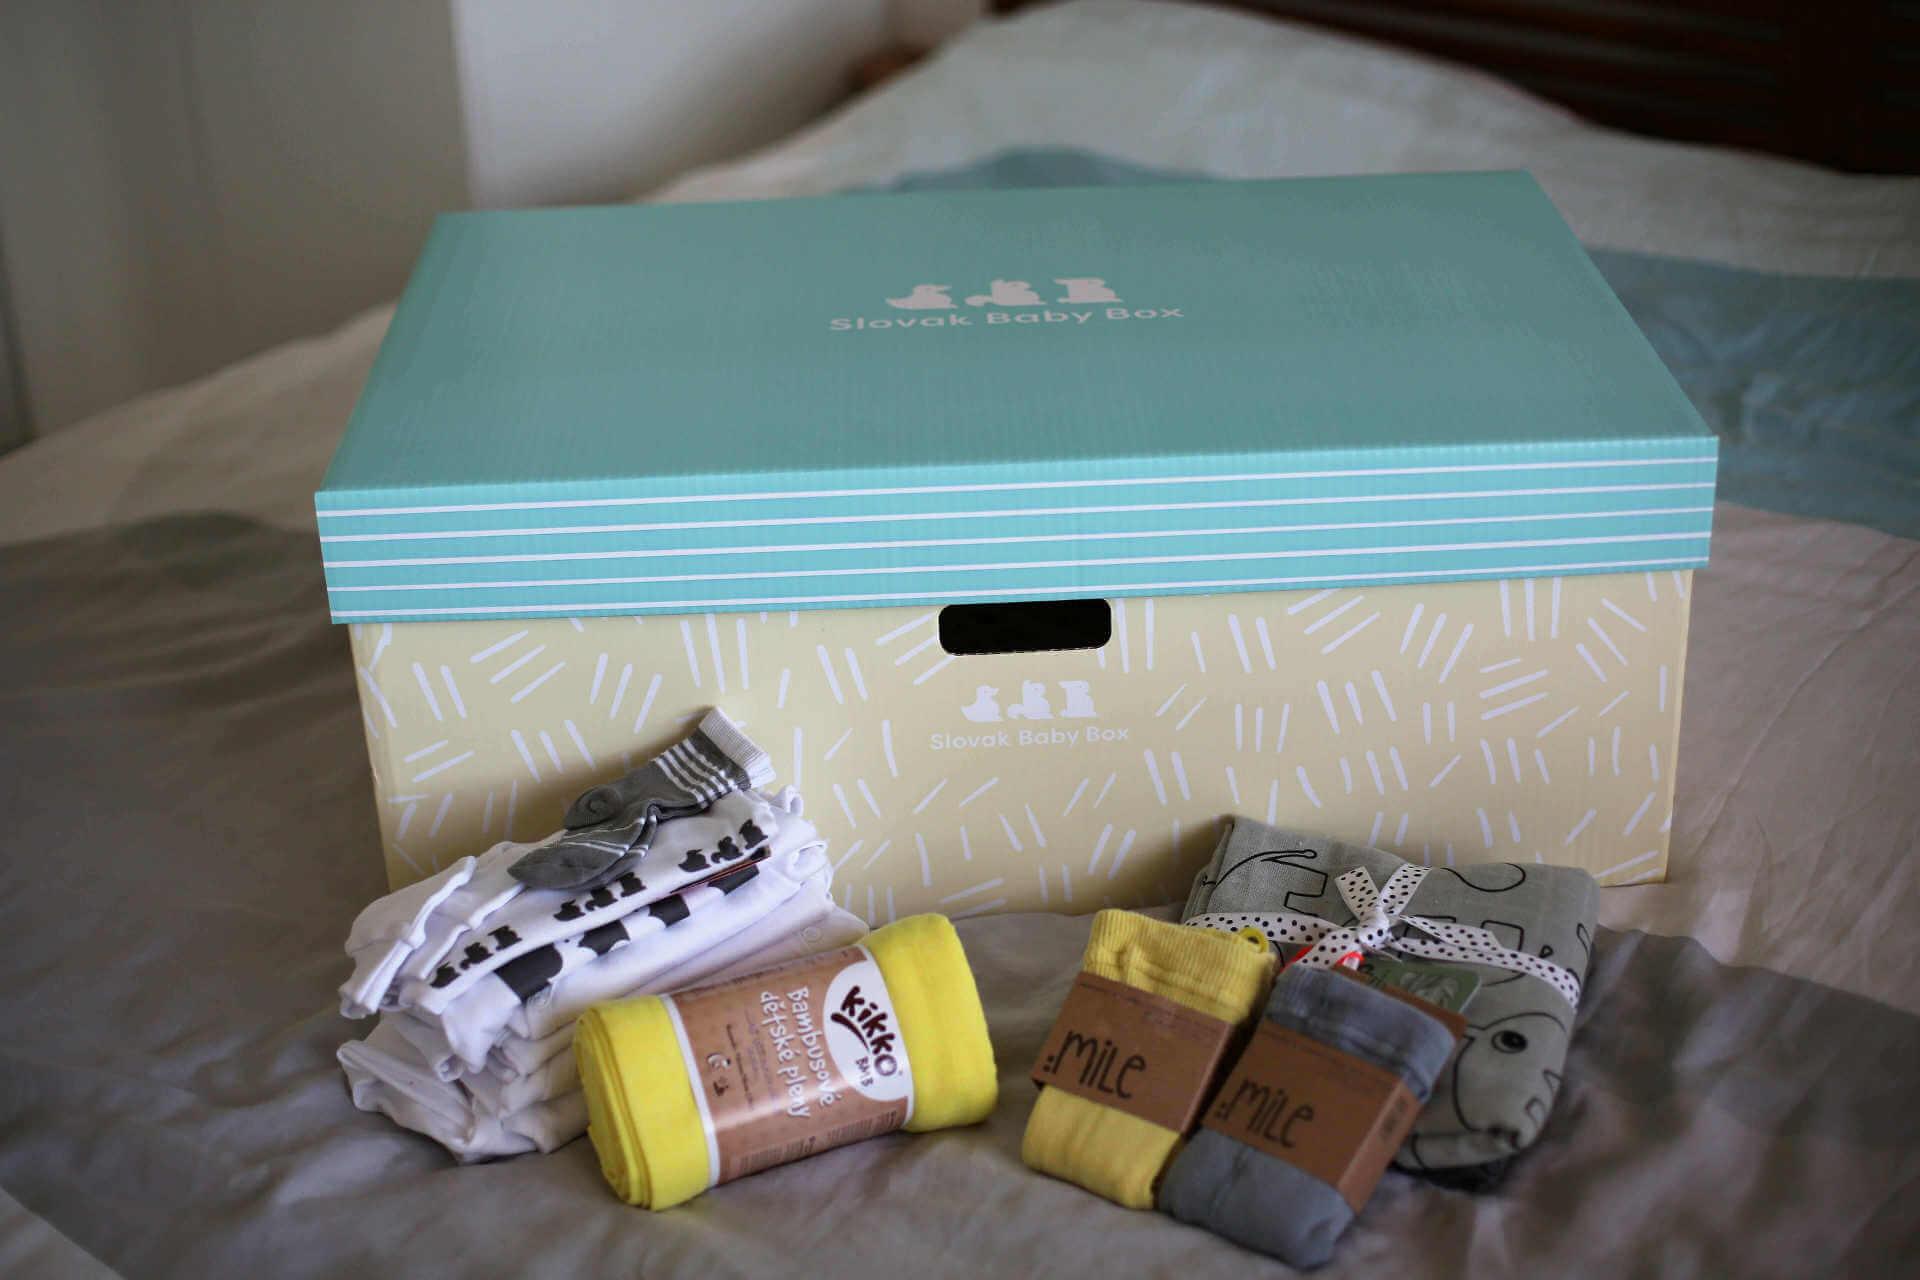 Slovak Baby Box